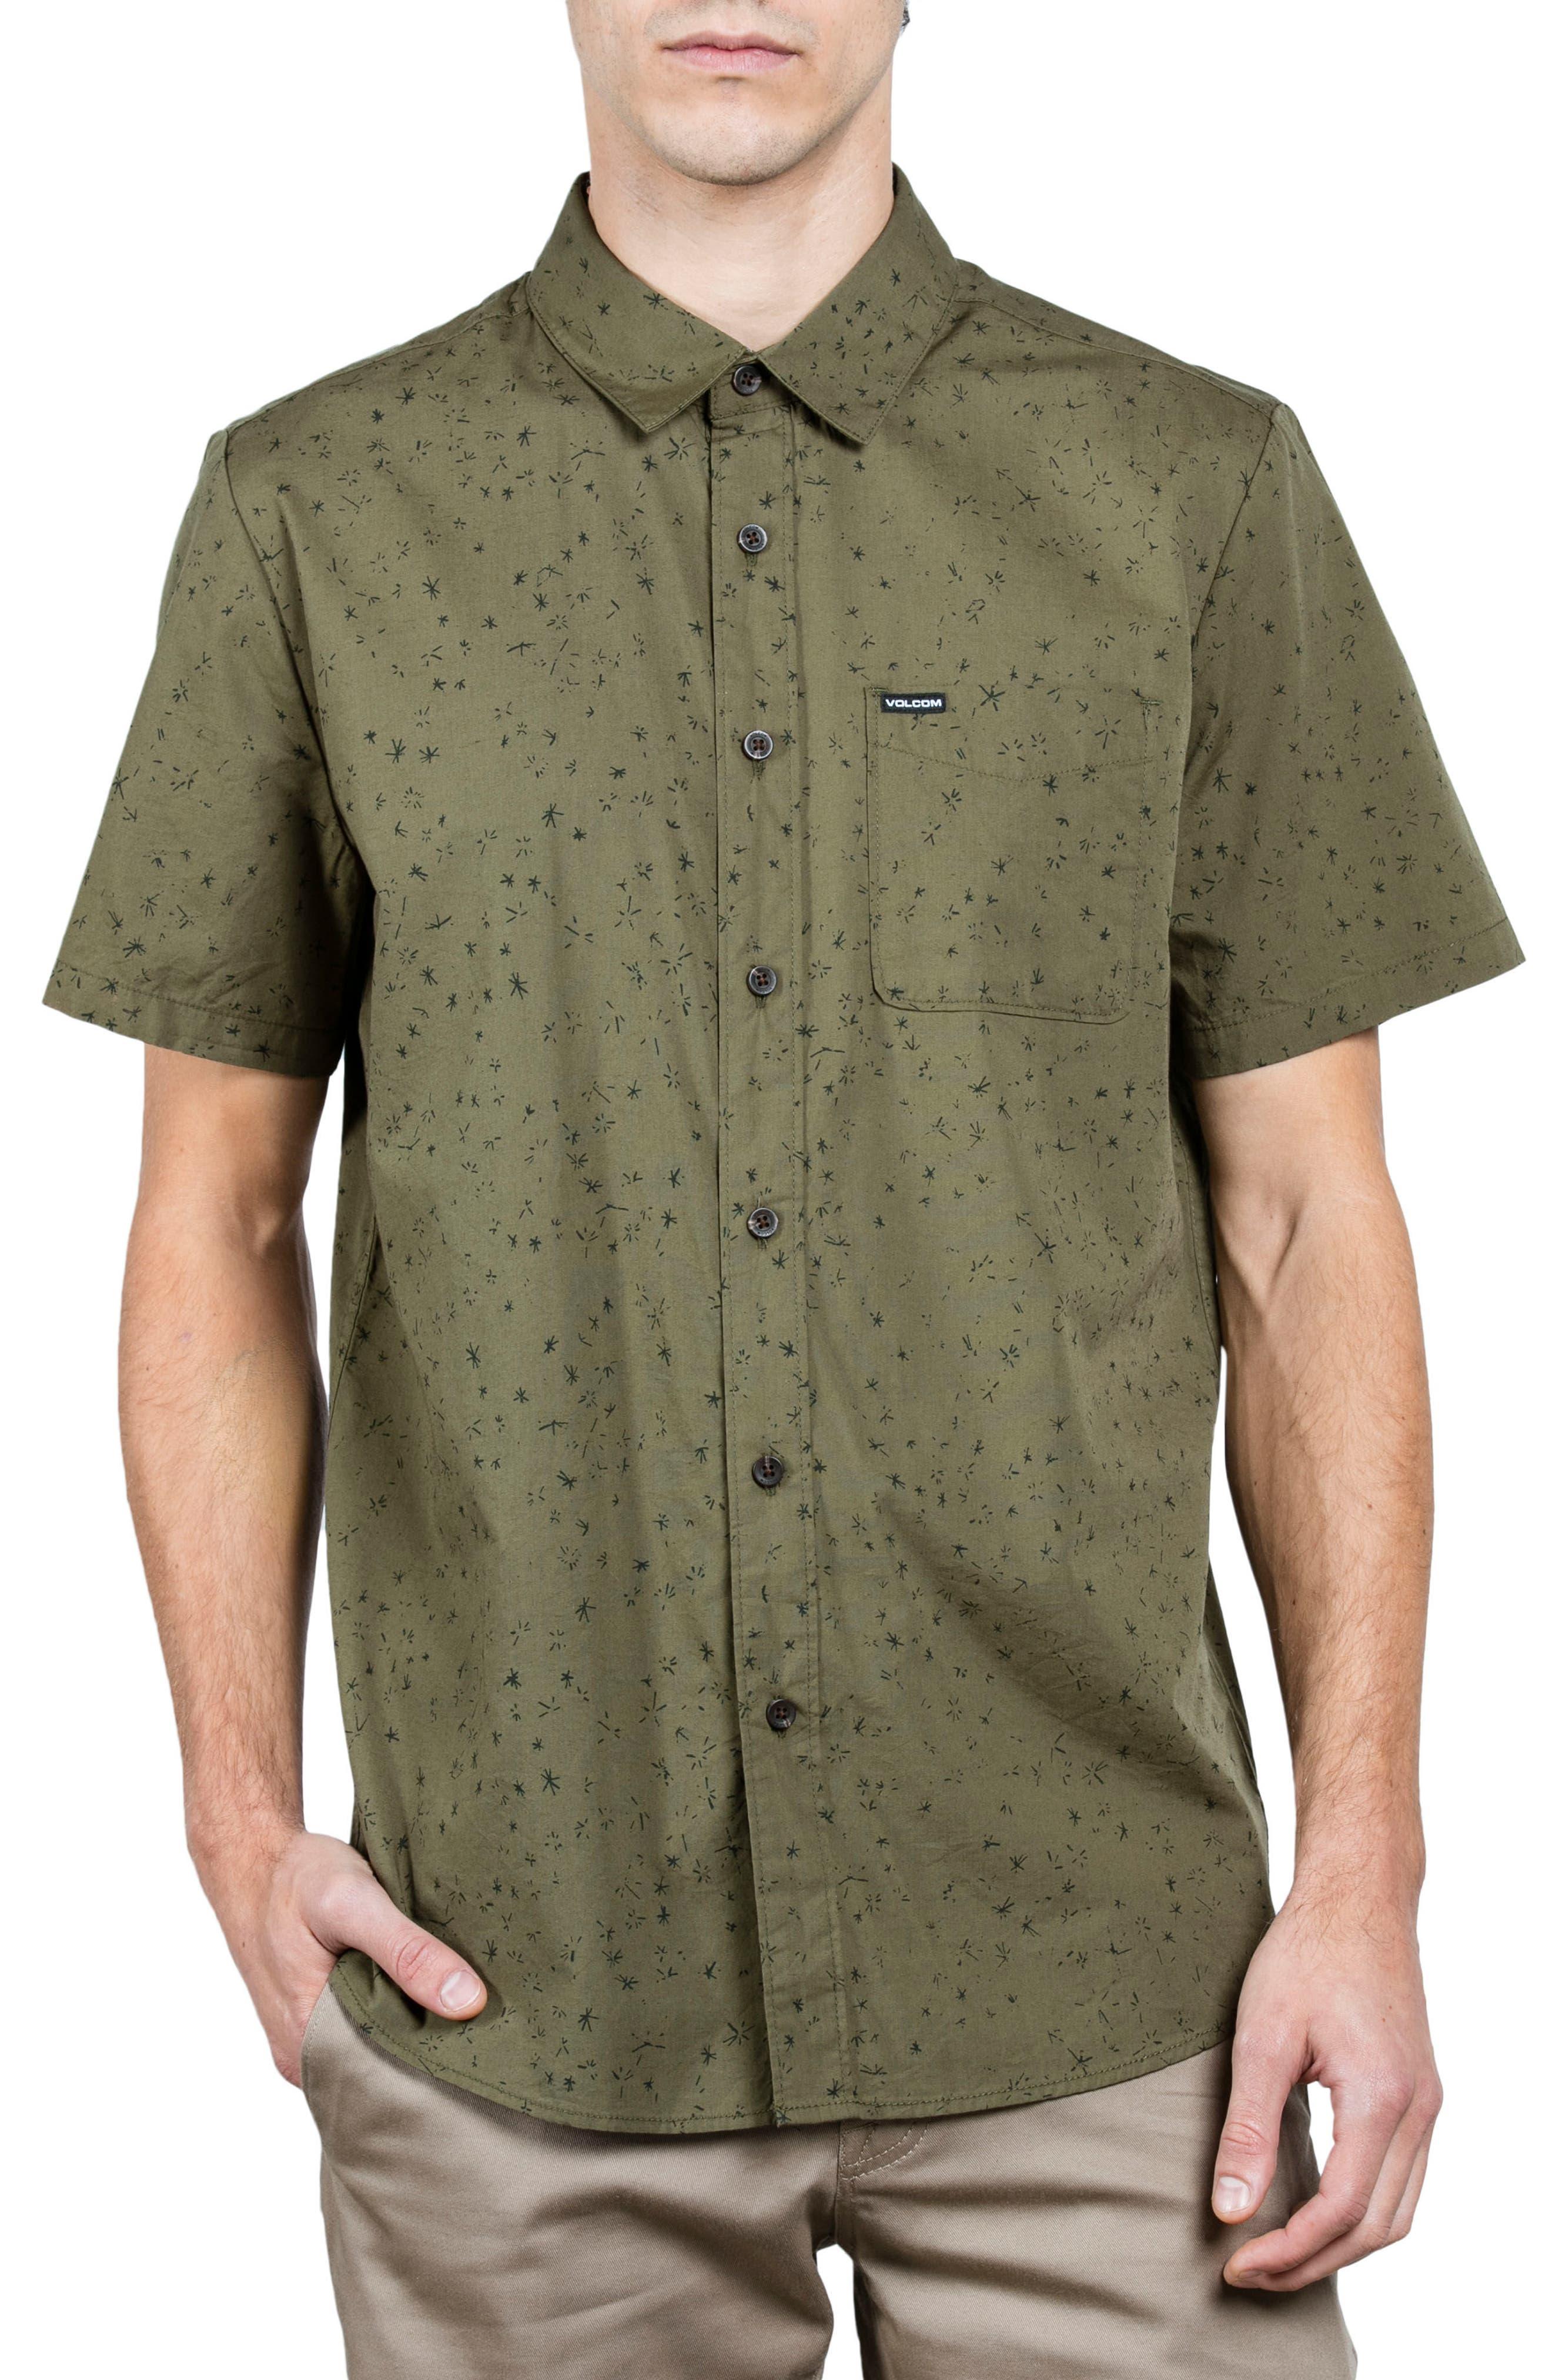 Volcom Smashed Stars Woven Shirt